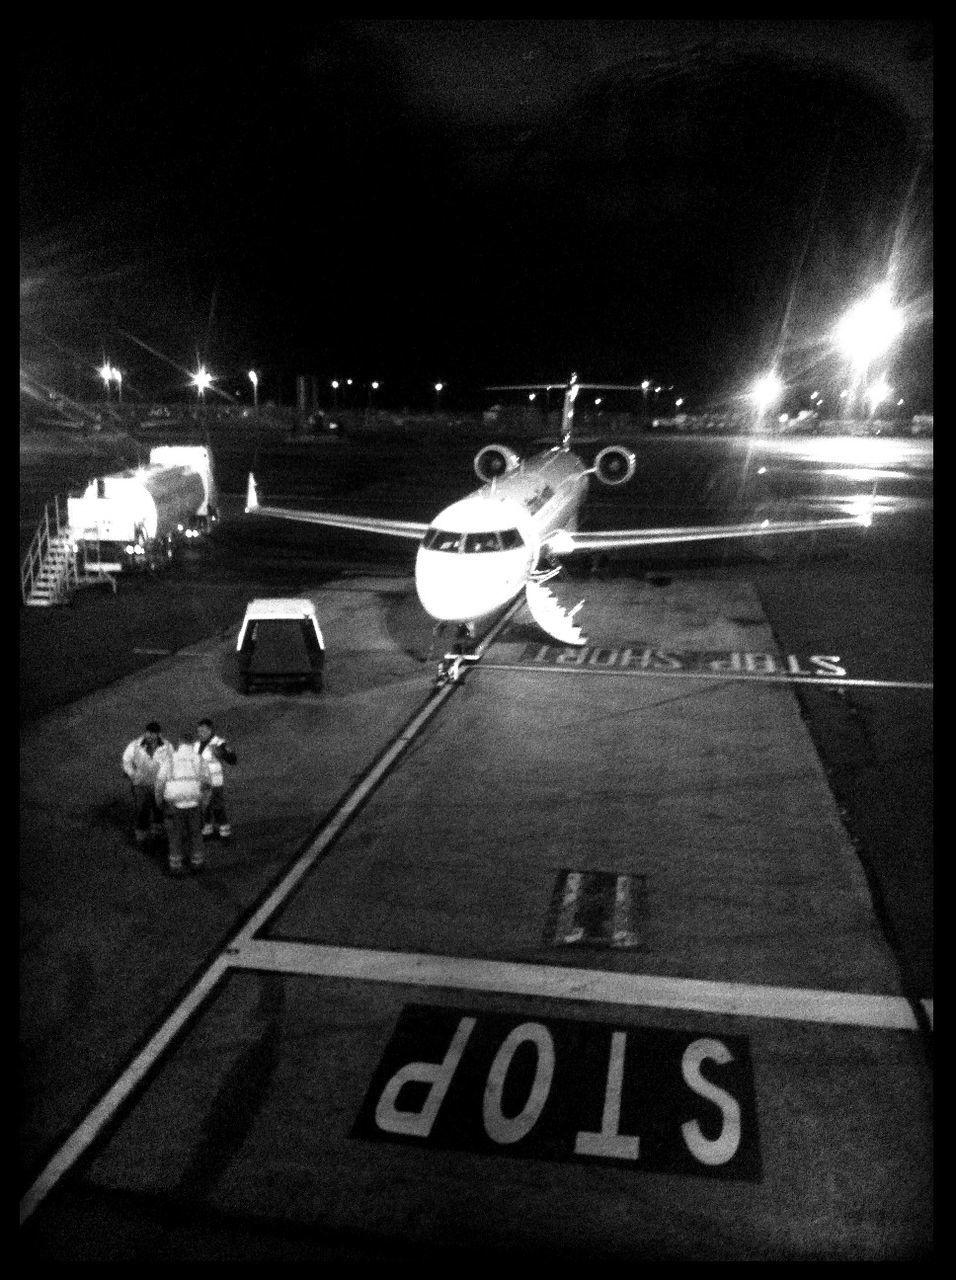 transportation, airport runway, mode of transport, night, illuminated, airport, airplane, car, air vehicle, land vehicle, outdoors, no people, runway